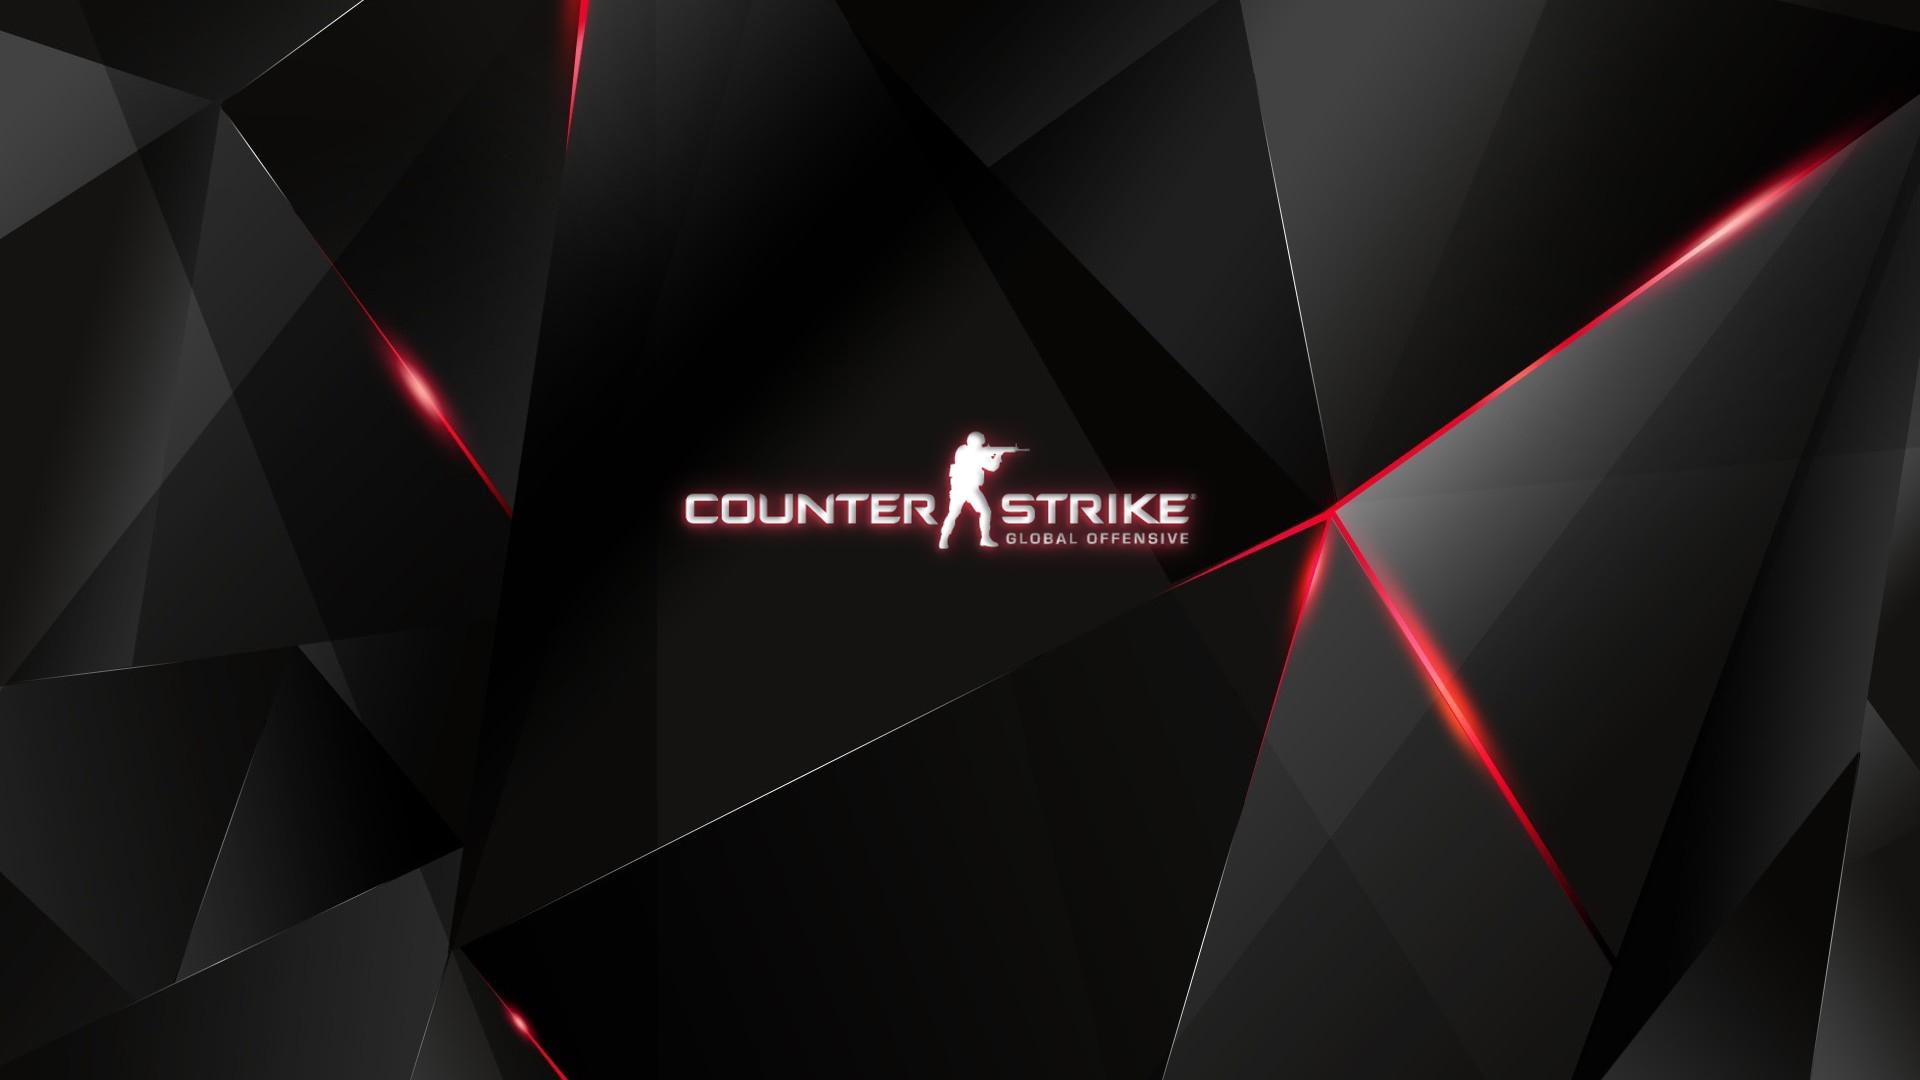 Steam Community CSGO Wallpaper 1080p by vkcomcsgo play 1920x1080